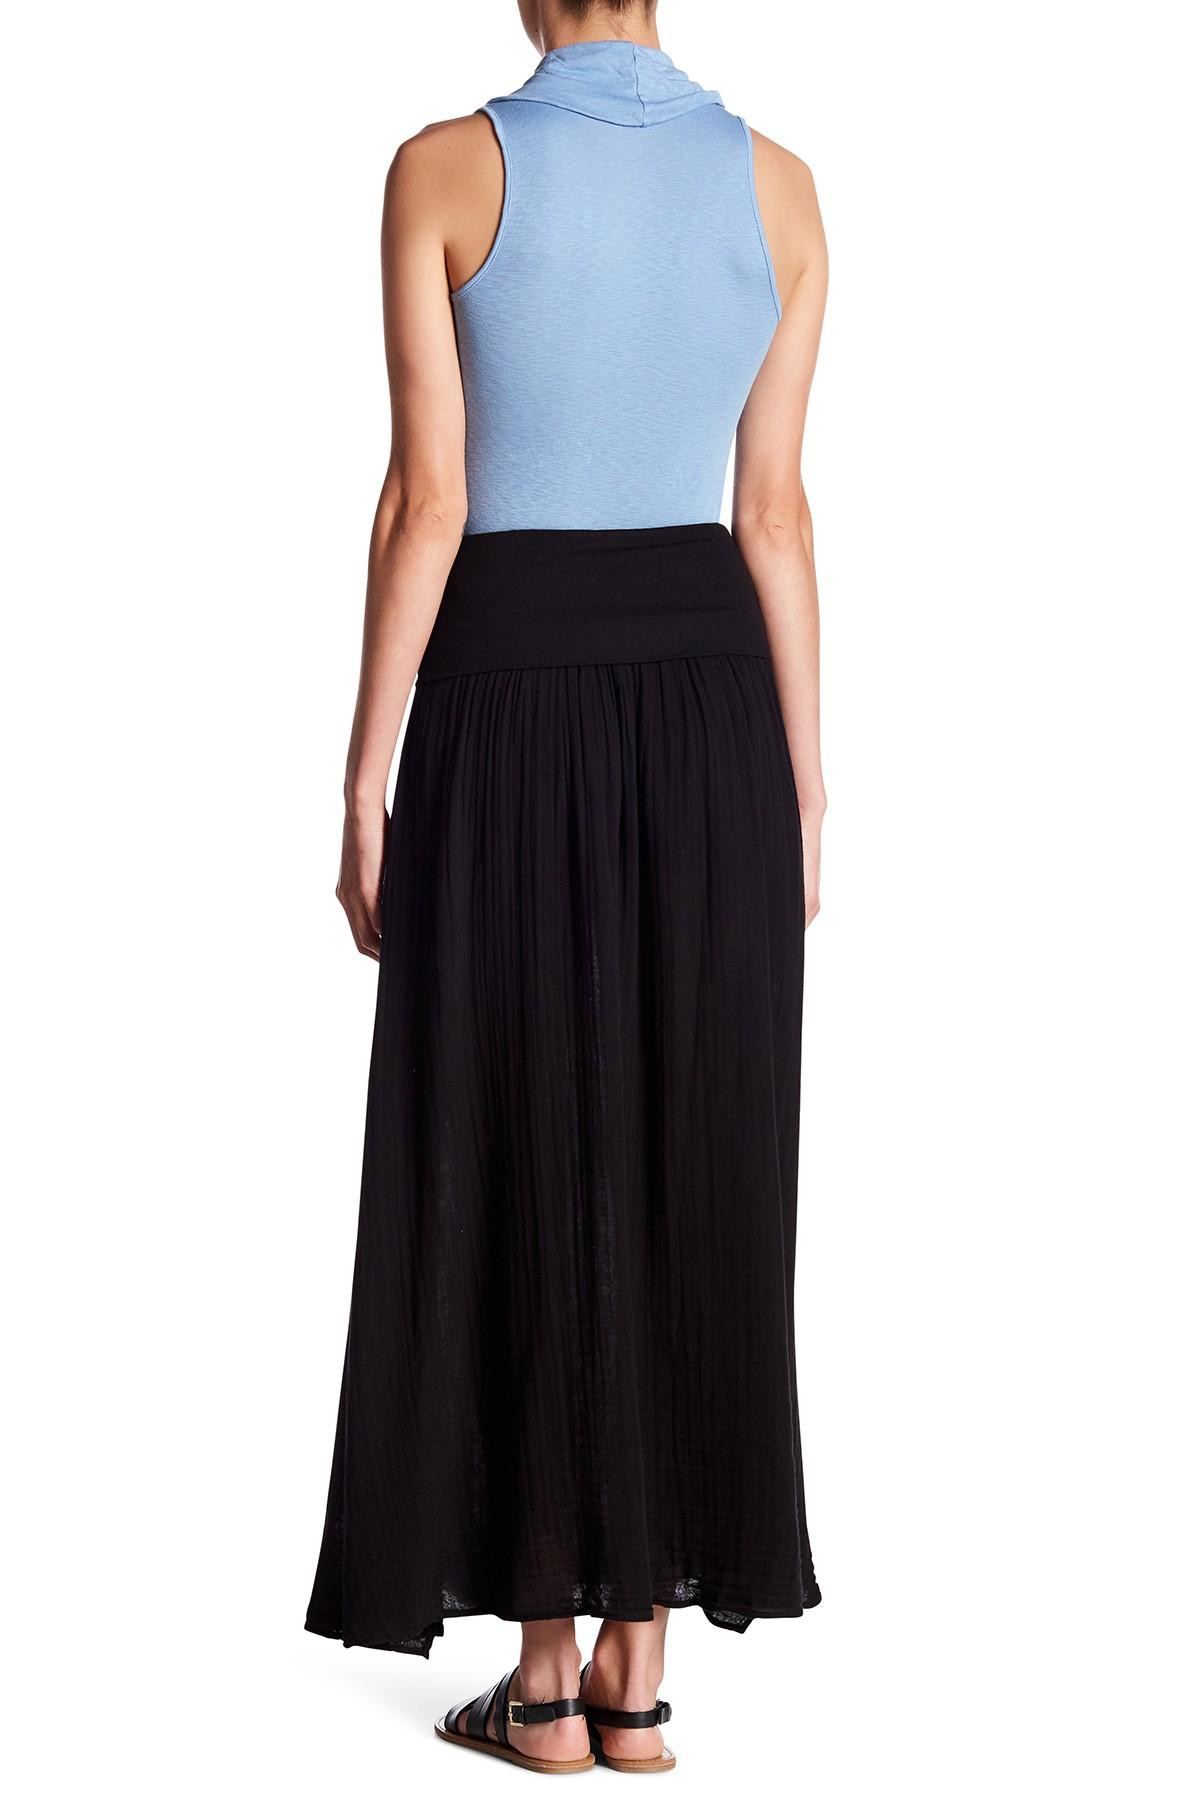 Lyst Three Dots Gathered Maxi Skirt In Black